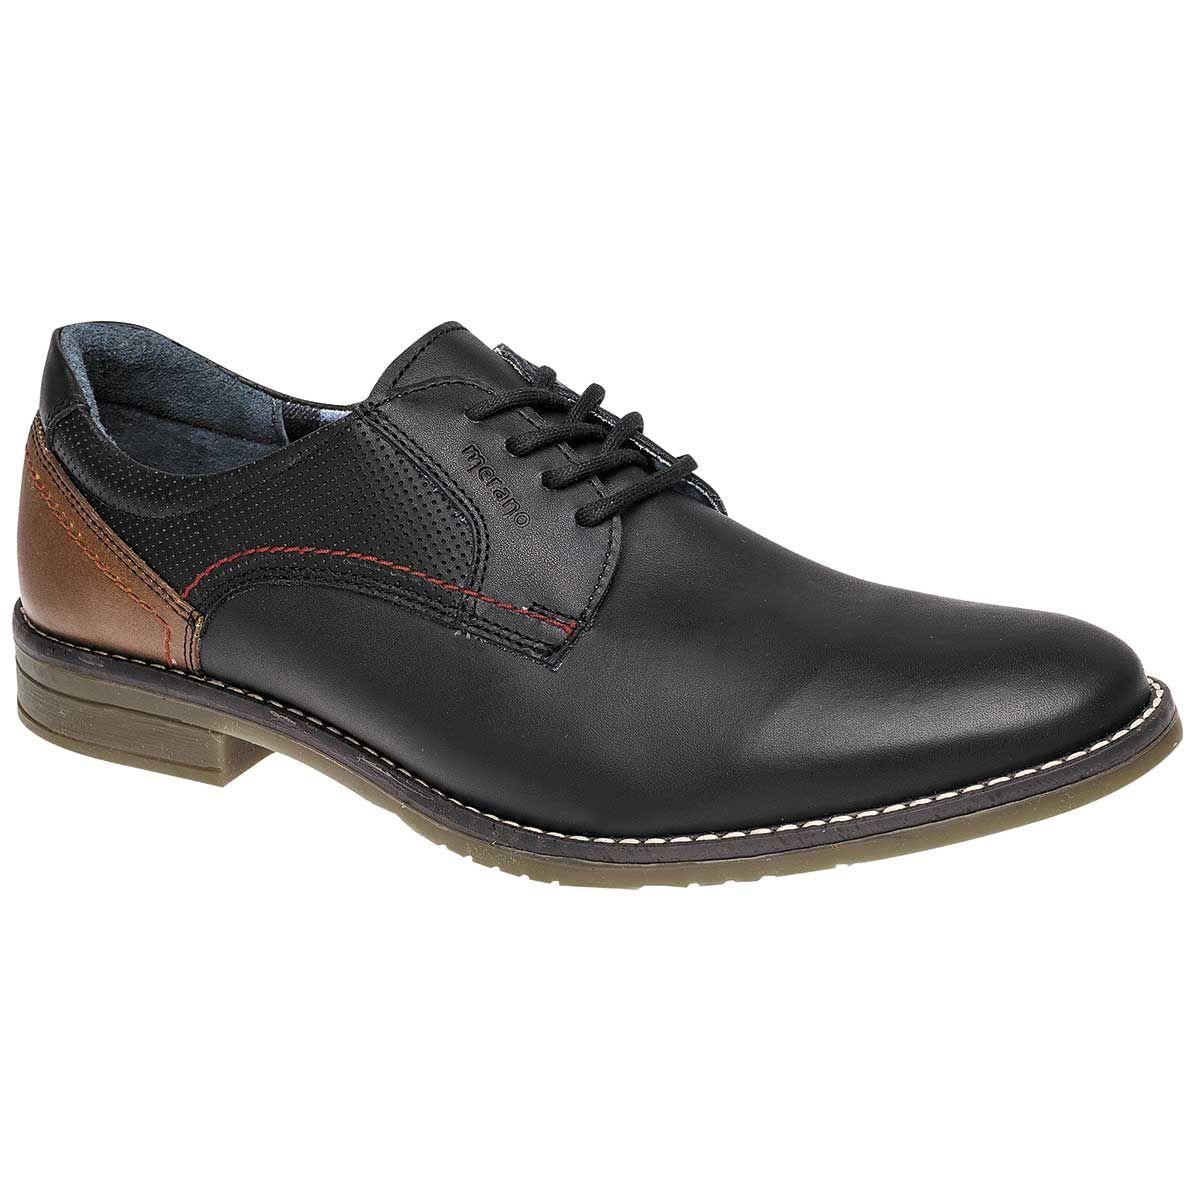 ClassyDude Zapatos de Cordones de Material Sintético Para Hombre Rojo Negro bKrRH86vRZ